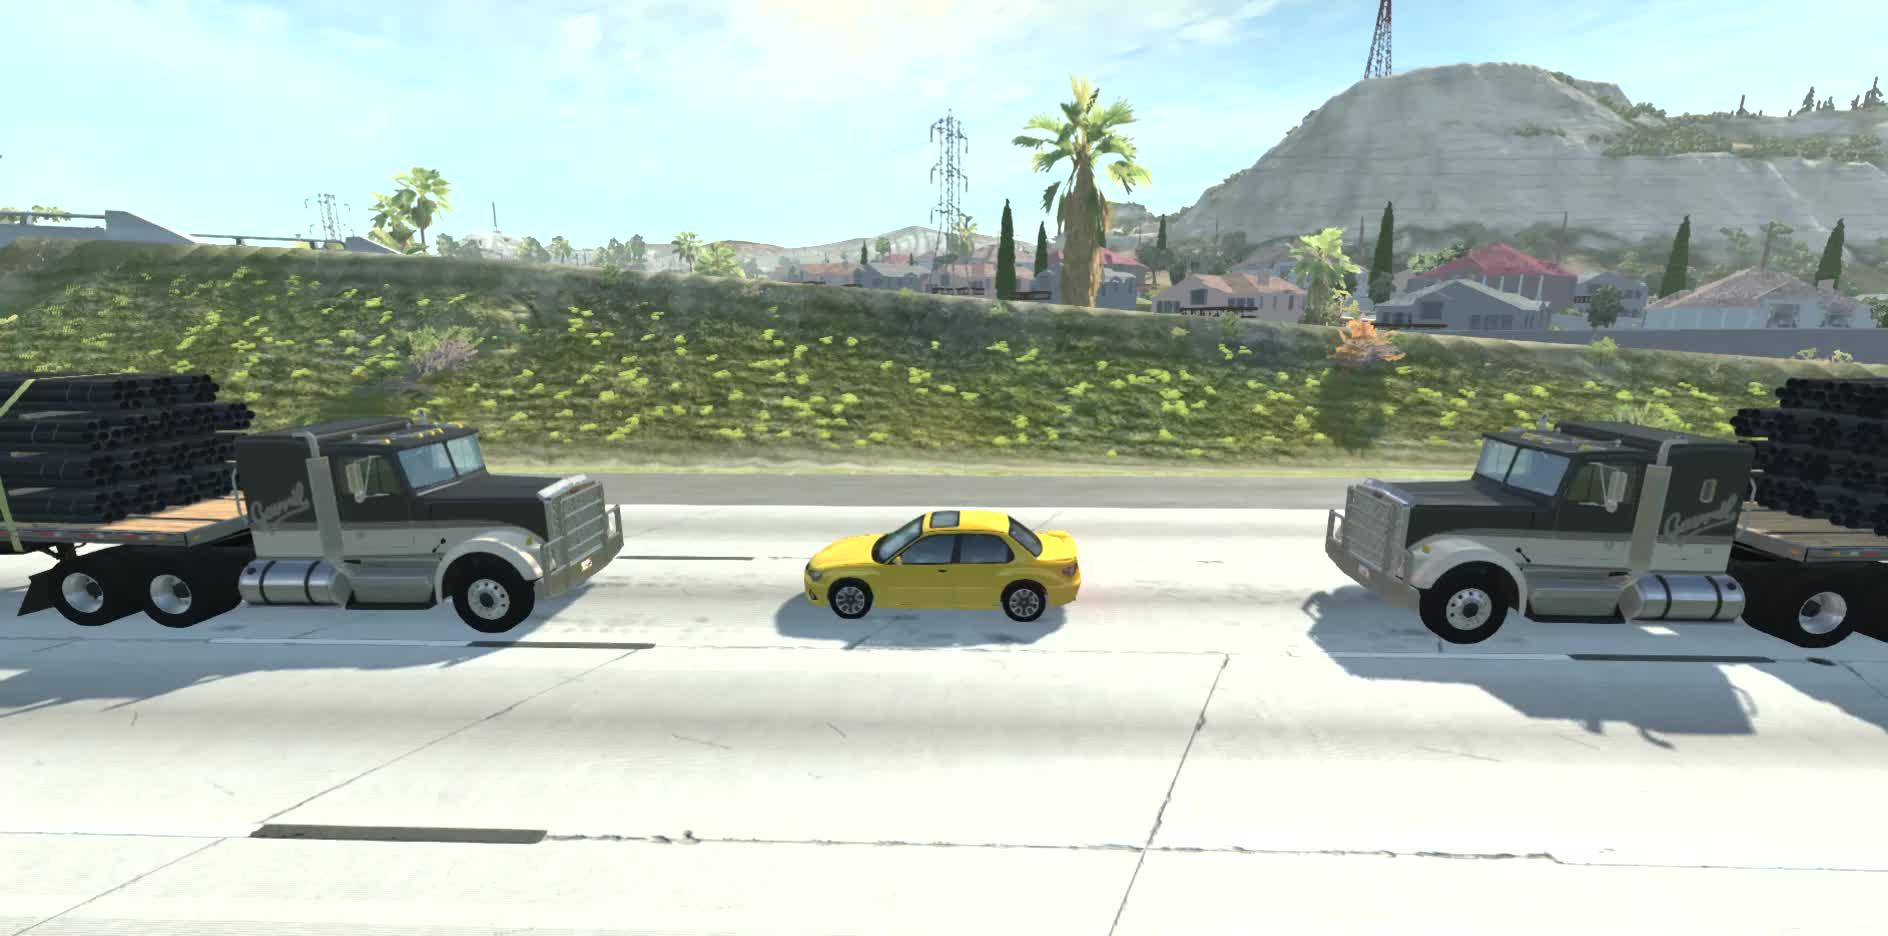 BeamNG, BeamNG.drive, Game Physics, Physics, Sandwiched, Semi truck vs car, Slow mo, Slow motion, Slowmotion, crushed, semi trucks, BeamNG - Sandwiched GIFs